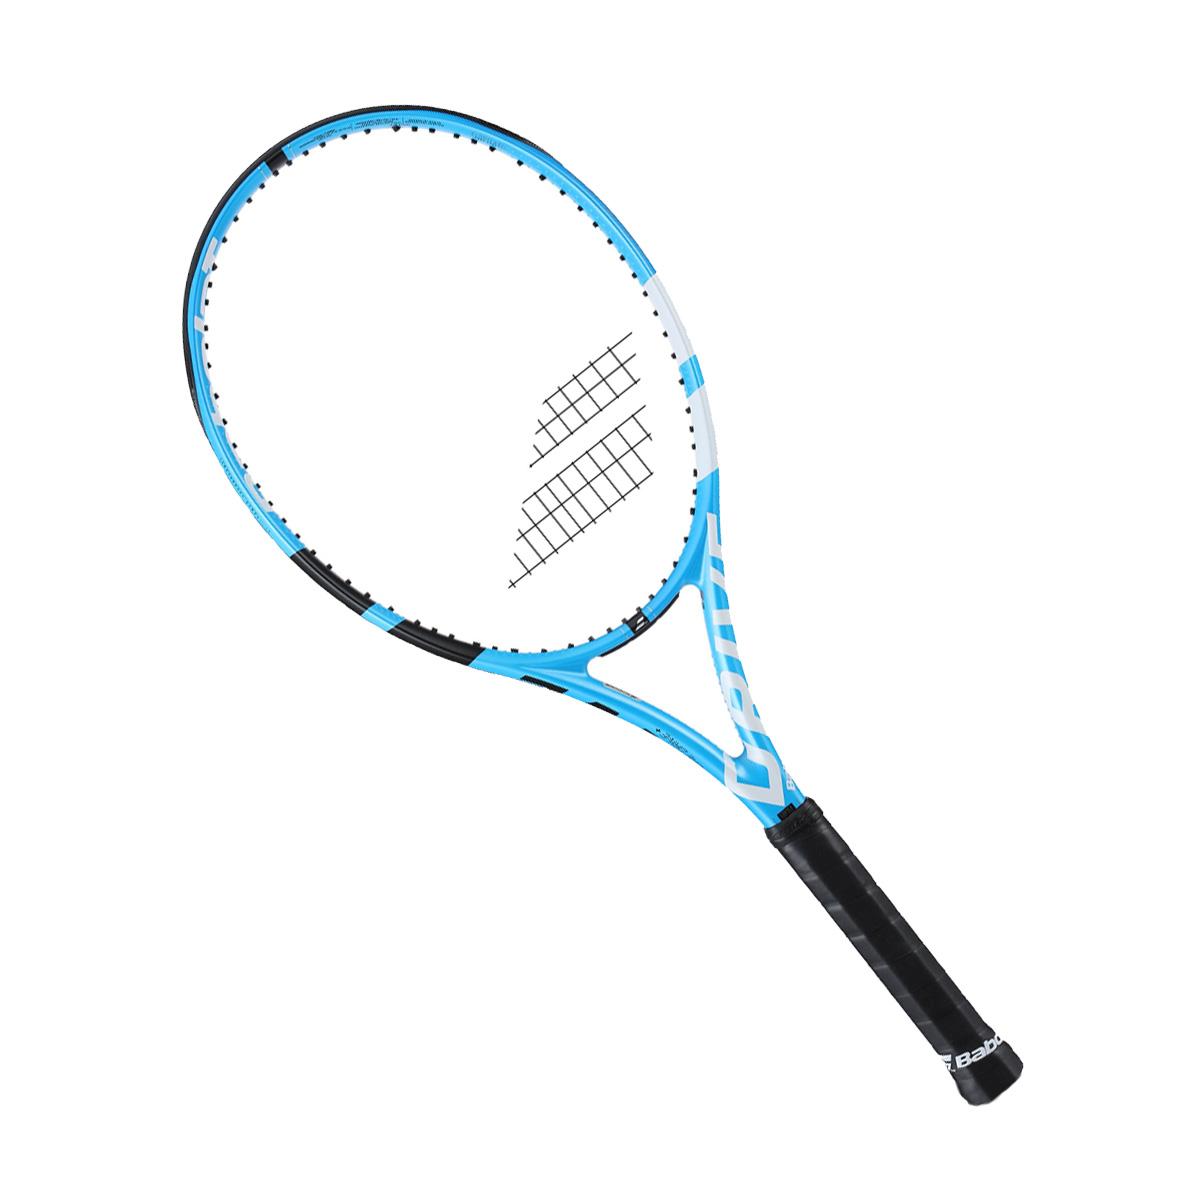 6c57875a7 Raquete de Tênis Babolat Pure Drive Plus - Empório do Tenista